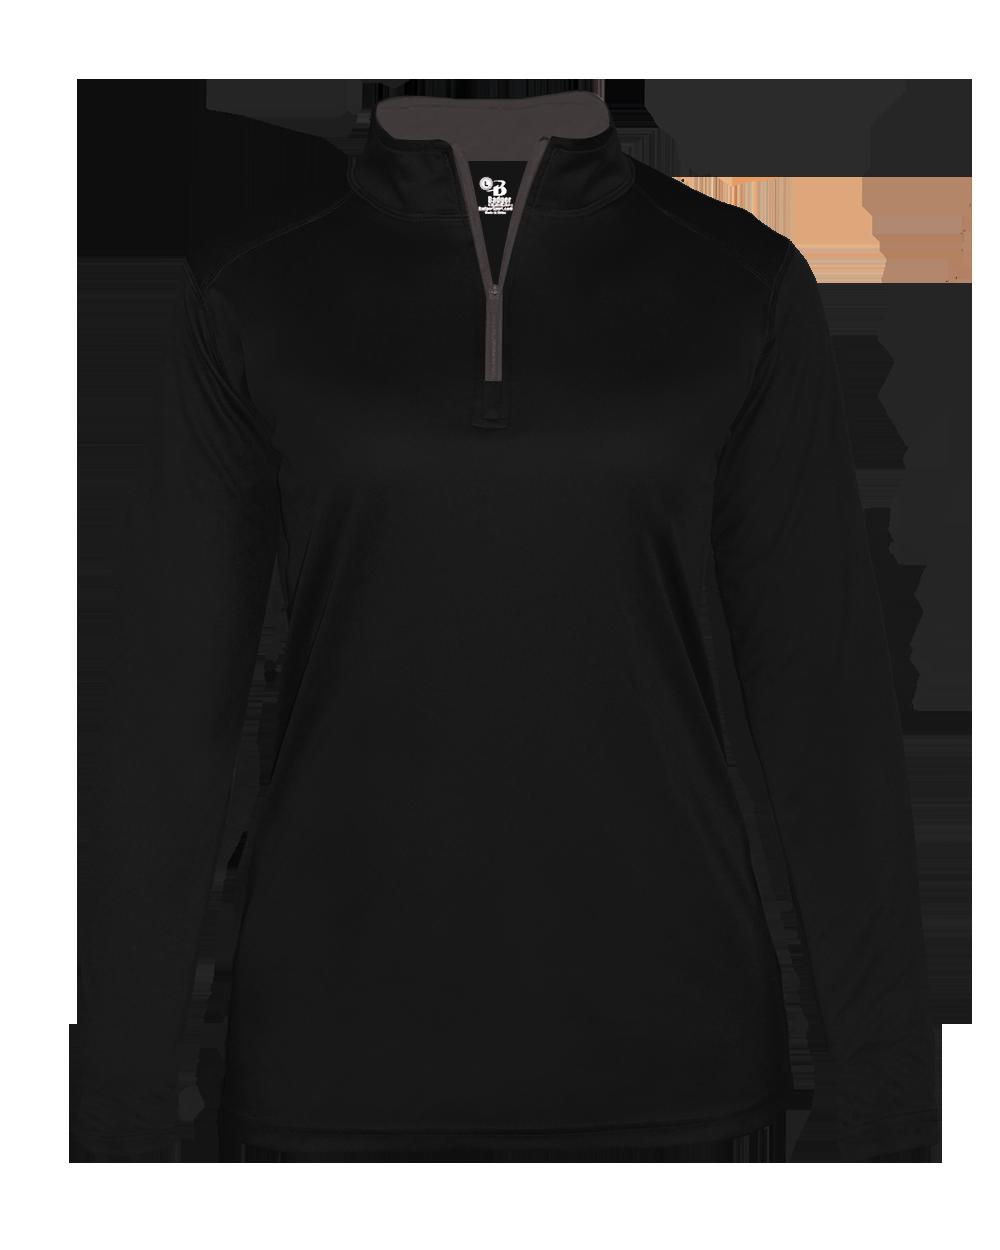 B-Core Women's 1/4 Zip - Black/Graphite